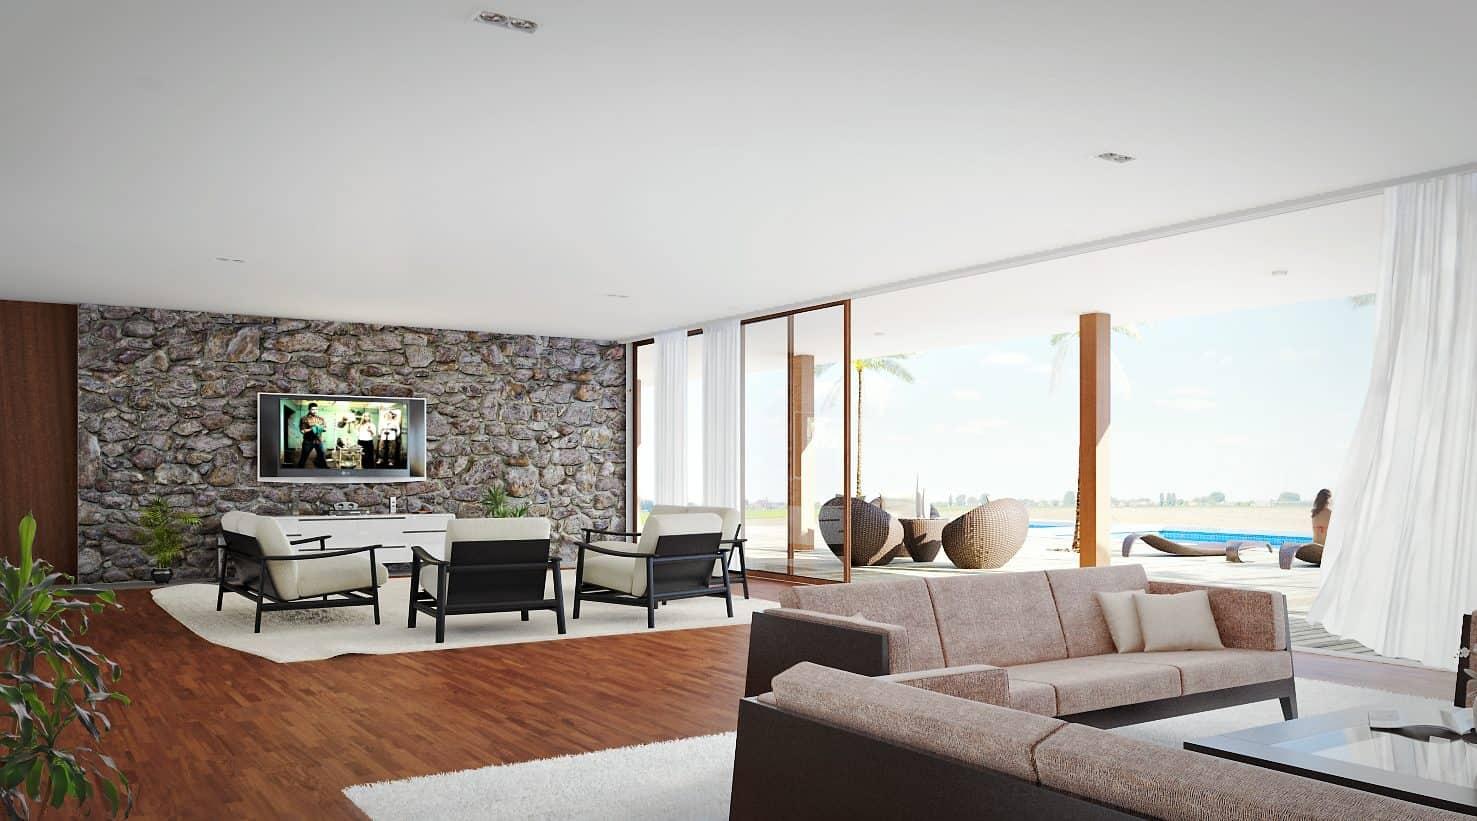 9 Tips Agar Rumah Tidak Gelap Dan Pengap